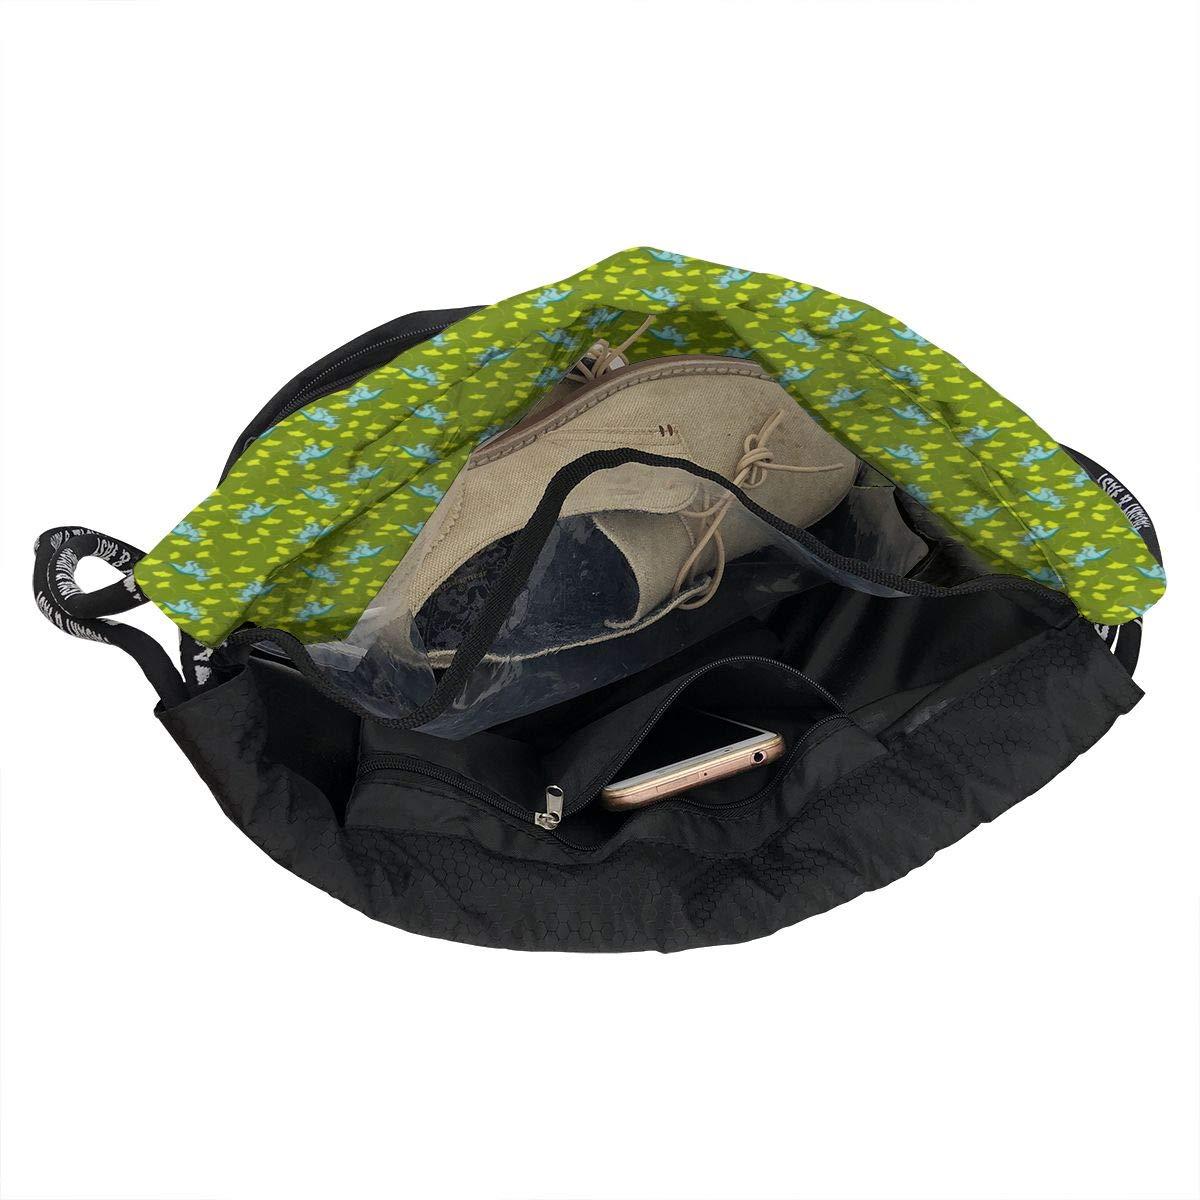 Luedino2012 Drawstring Backpack Sports Athletic Gym Cinch Sack String Storage Bags for Hiking Travel Beach